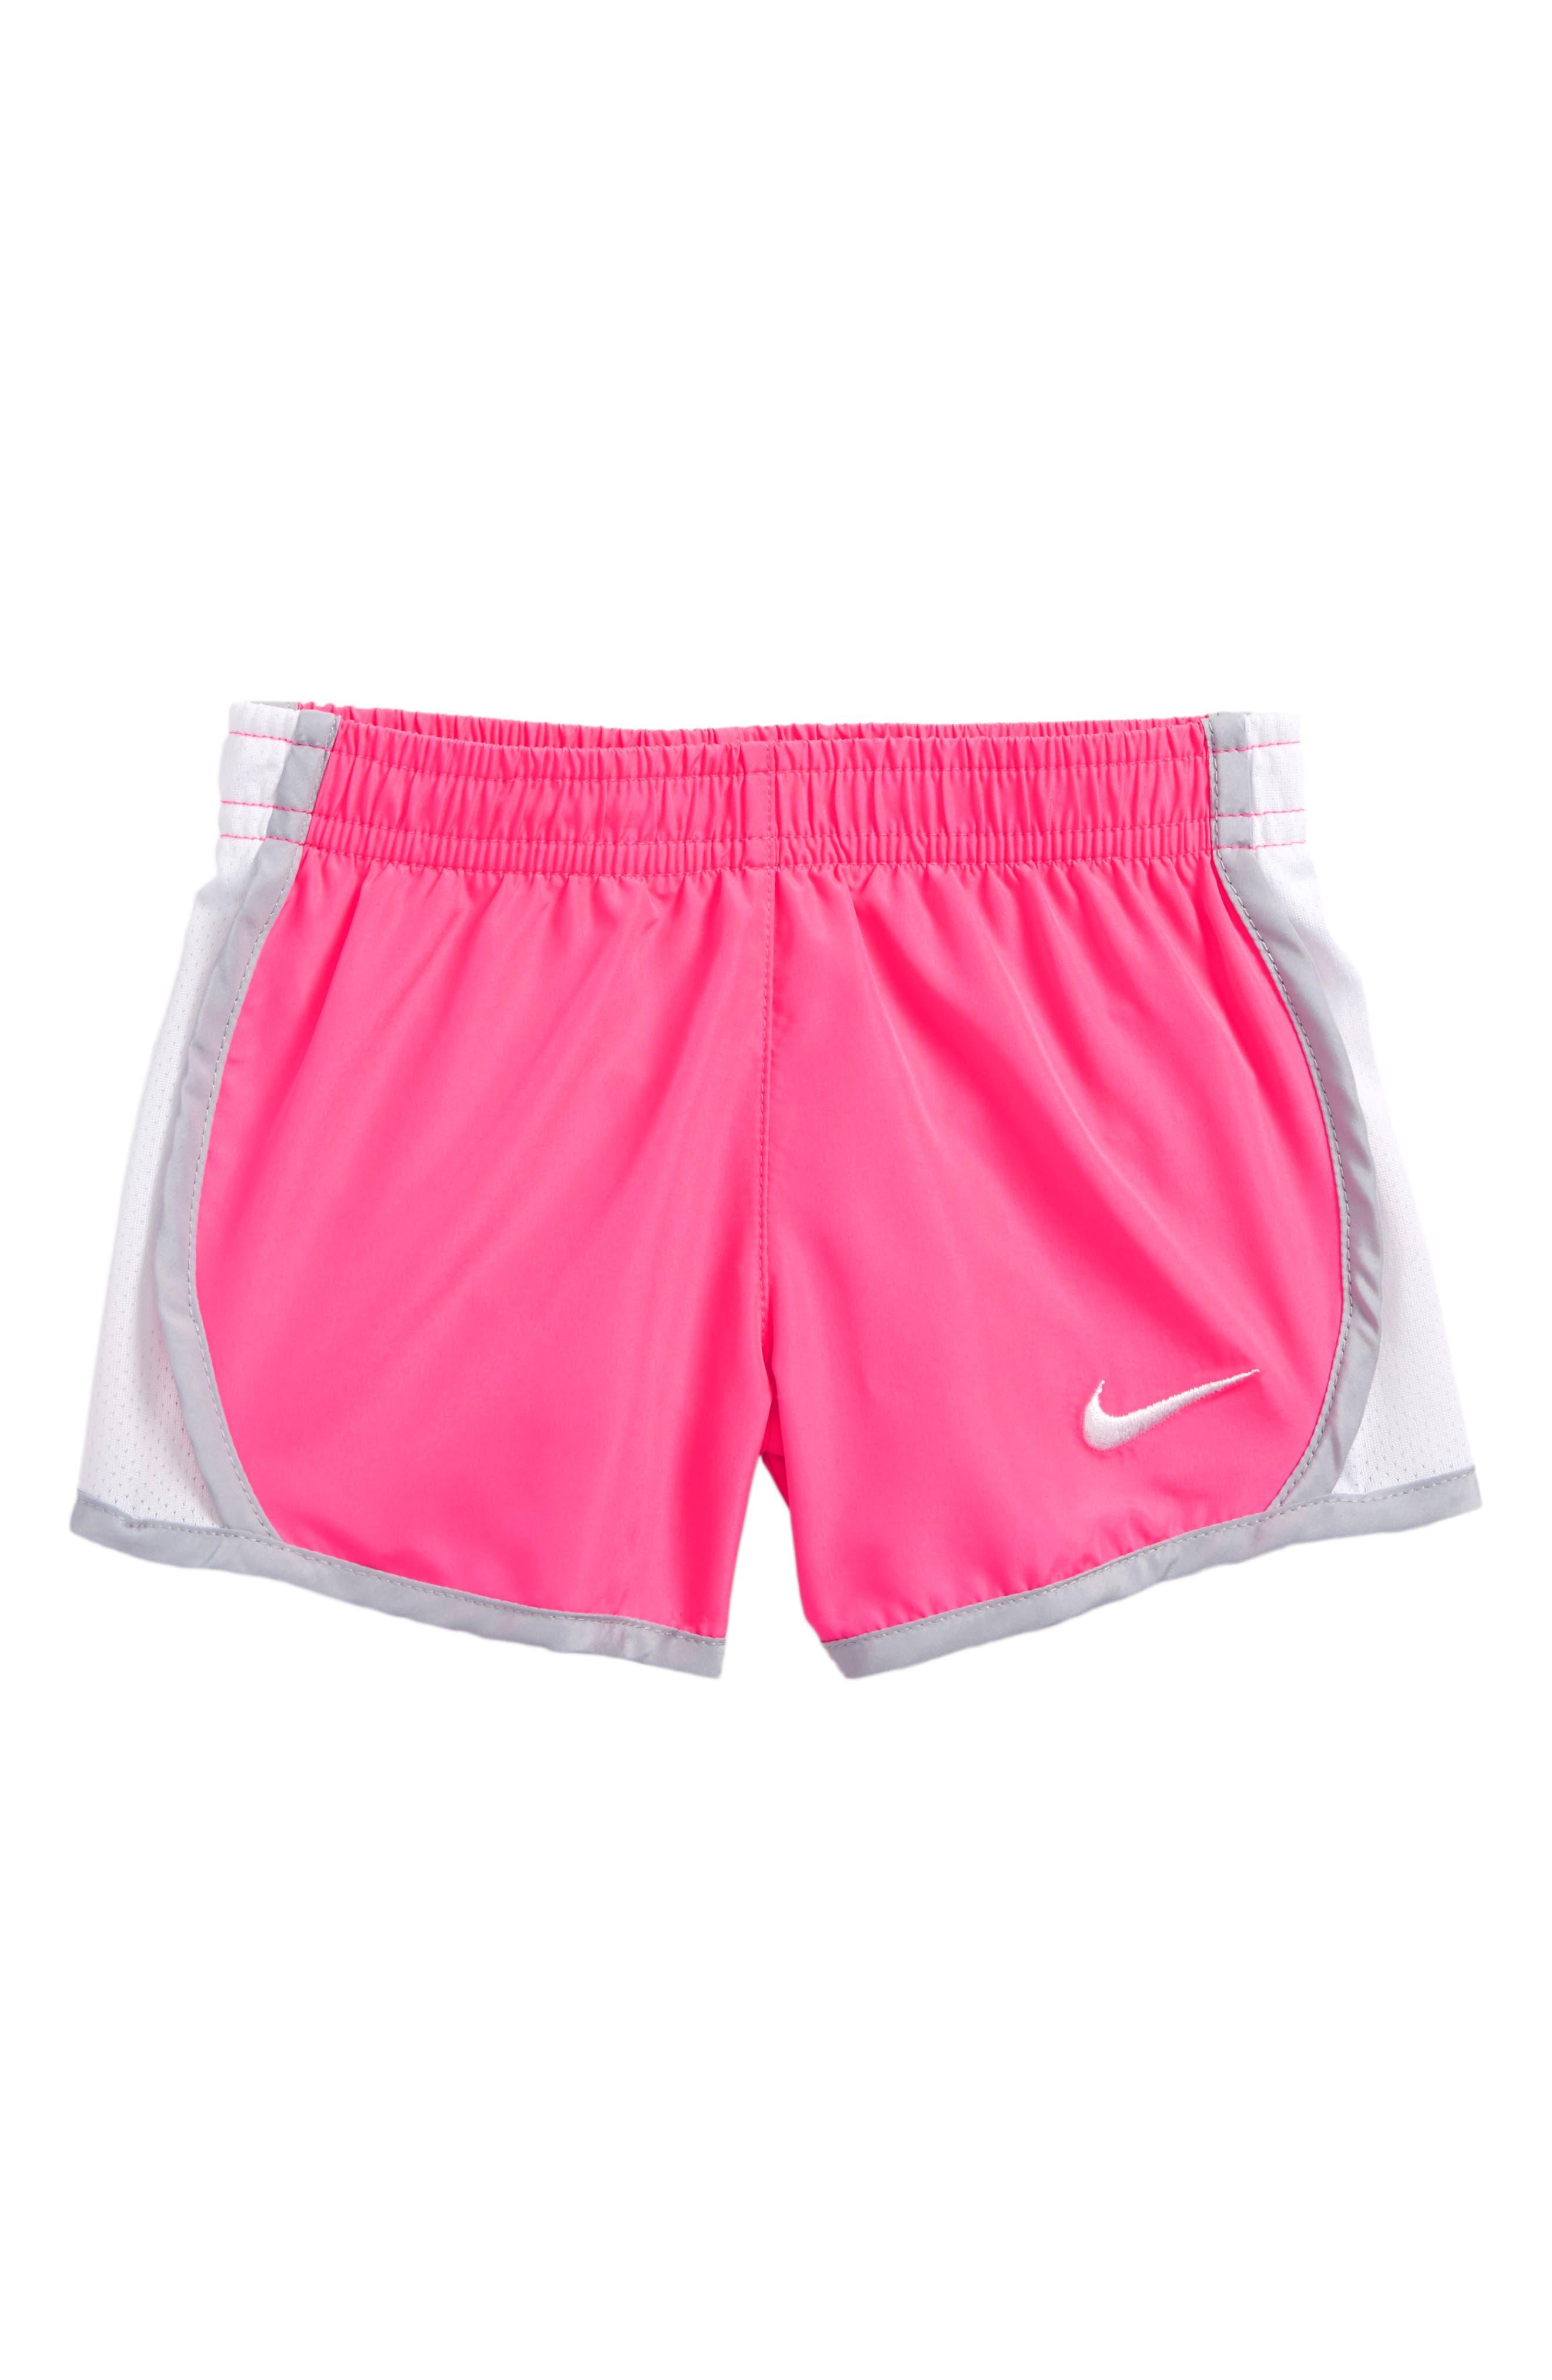 Main Image - Nike 'Tempo' Dri-FIT Shorts (Baby Girls)